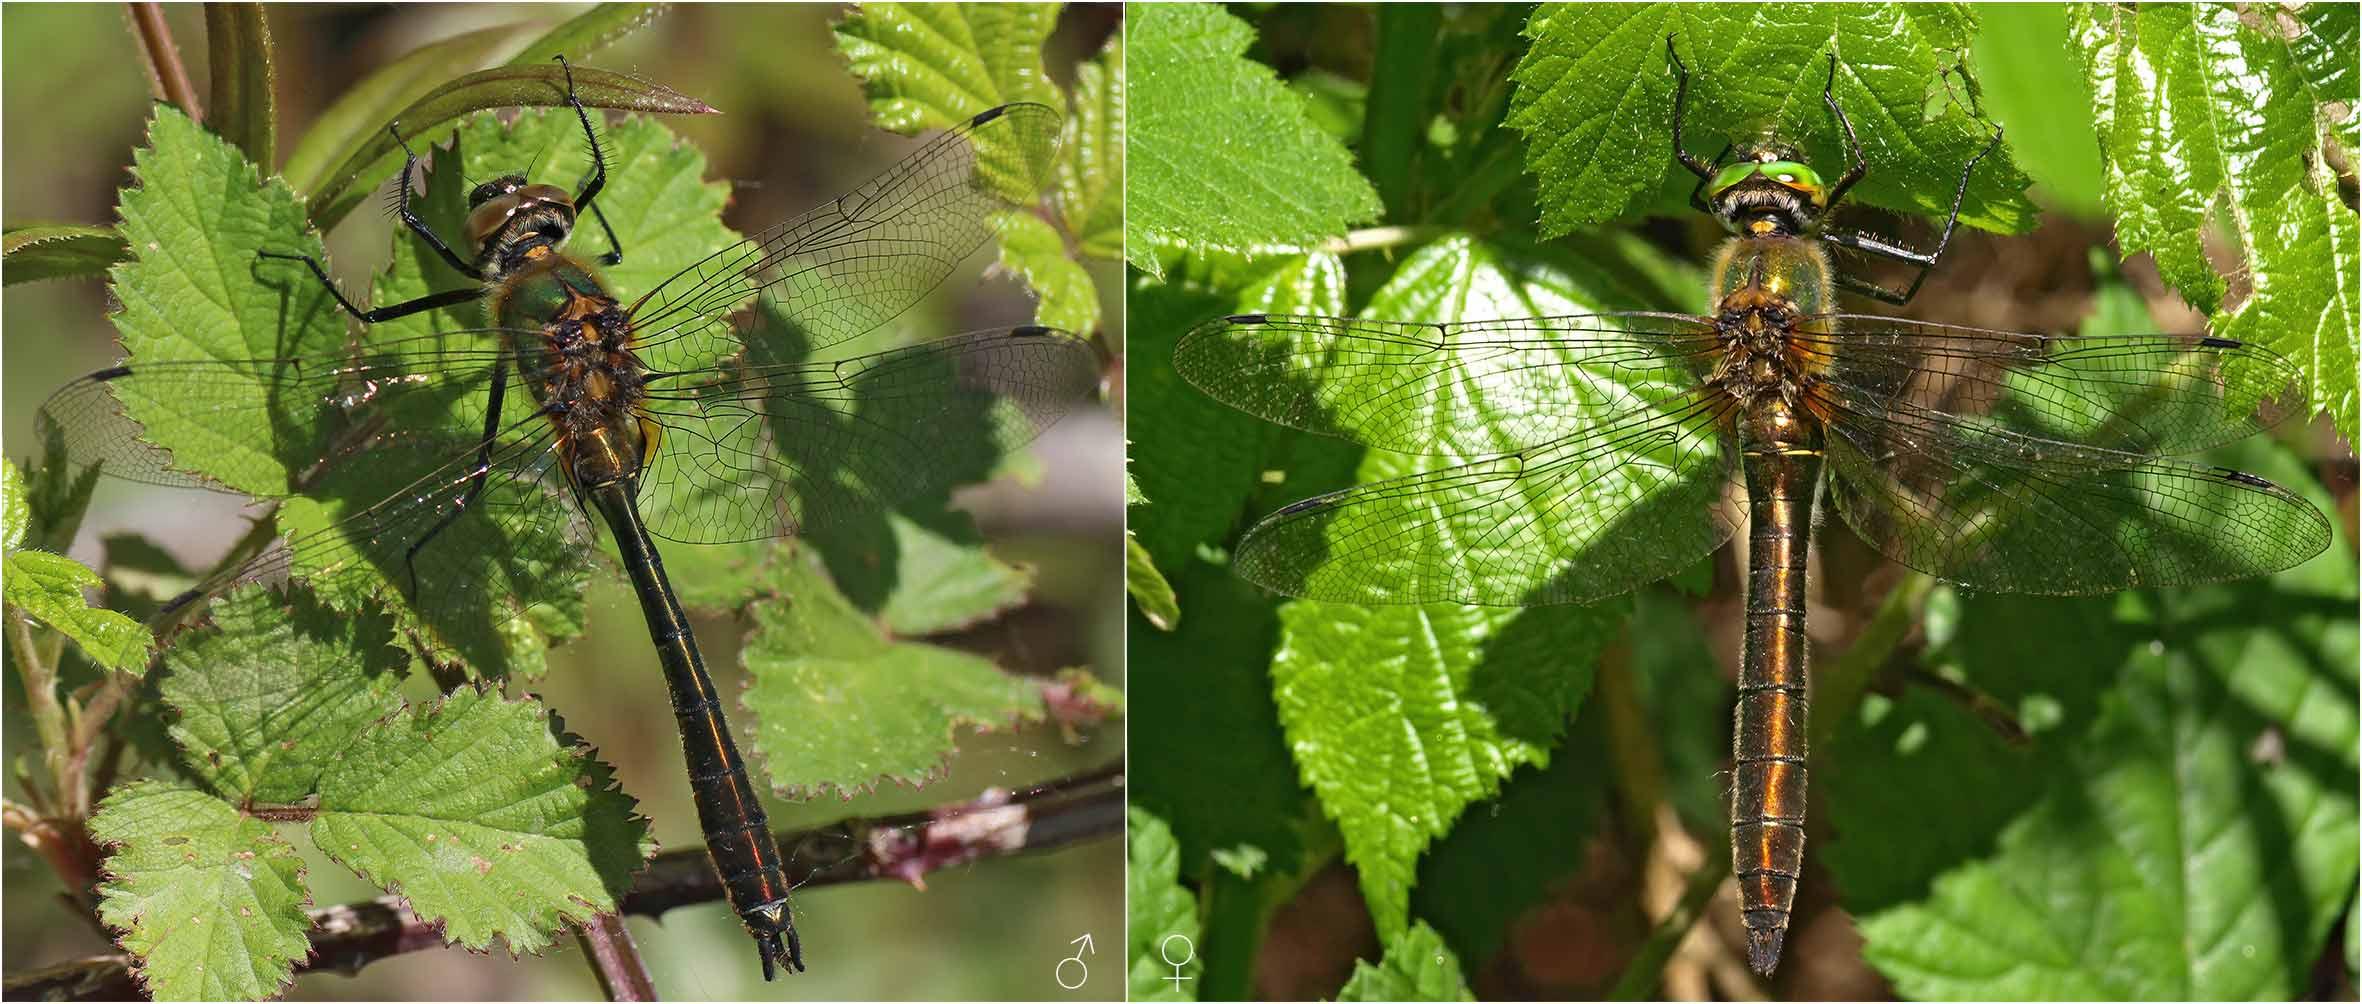 Cordulia aenea mâle et femelle, France